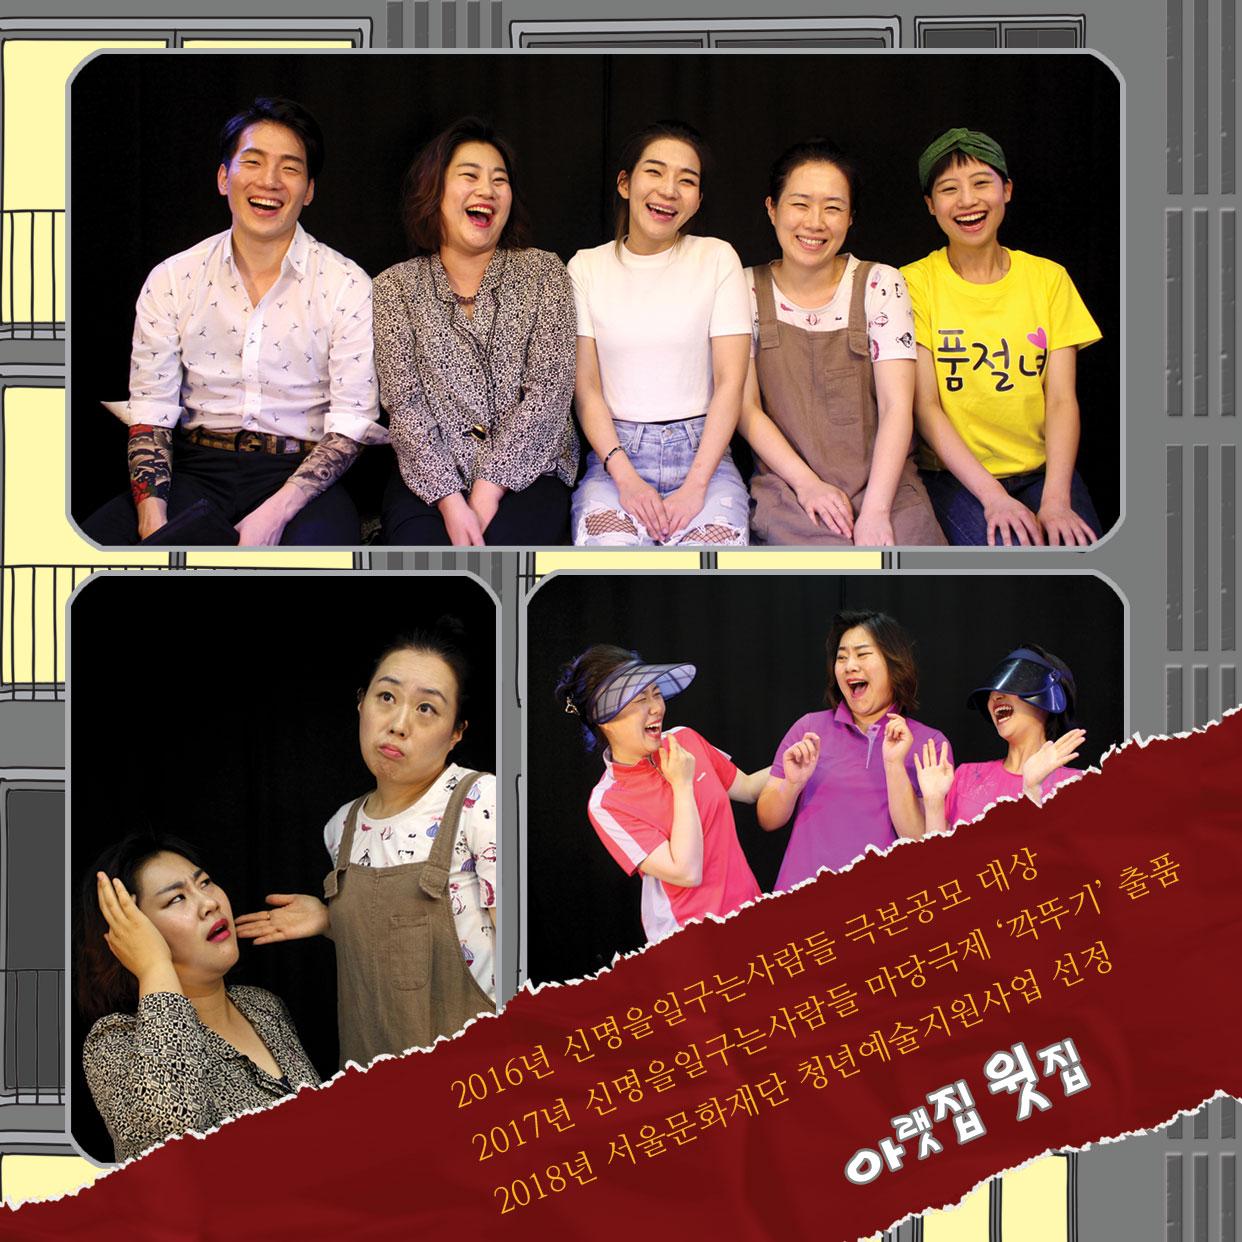 Web_홍보용3_1242_1242.jpg